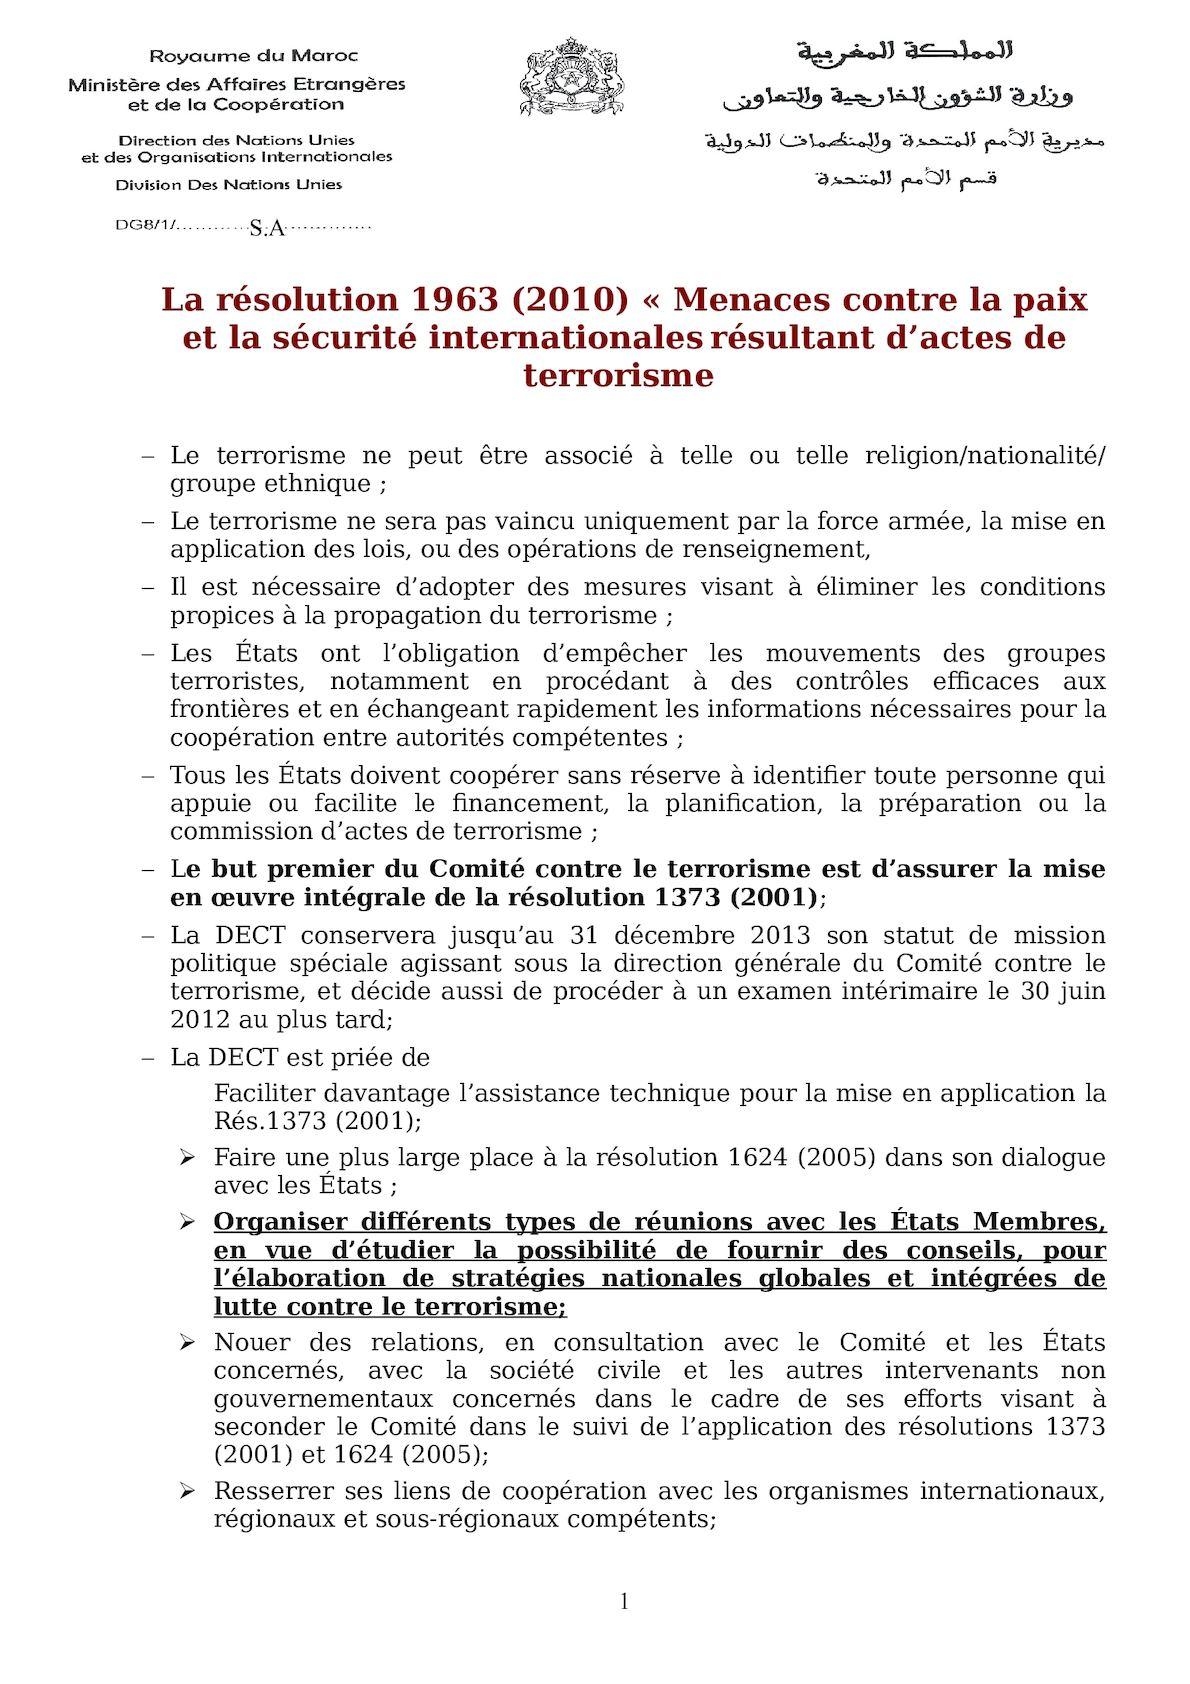 Résolution 1963 (2010) - Synthèse